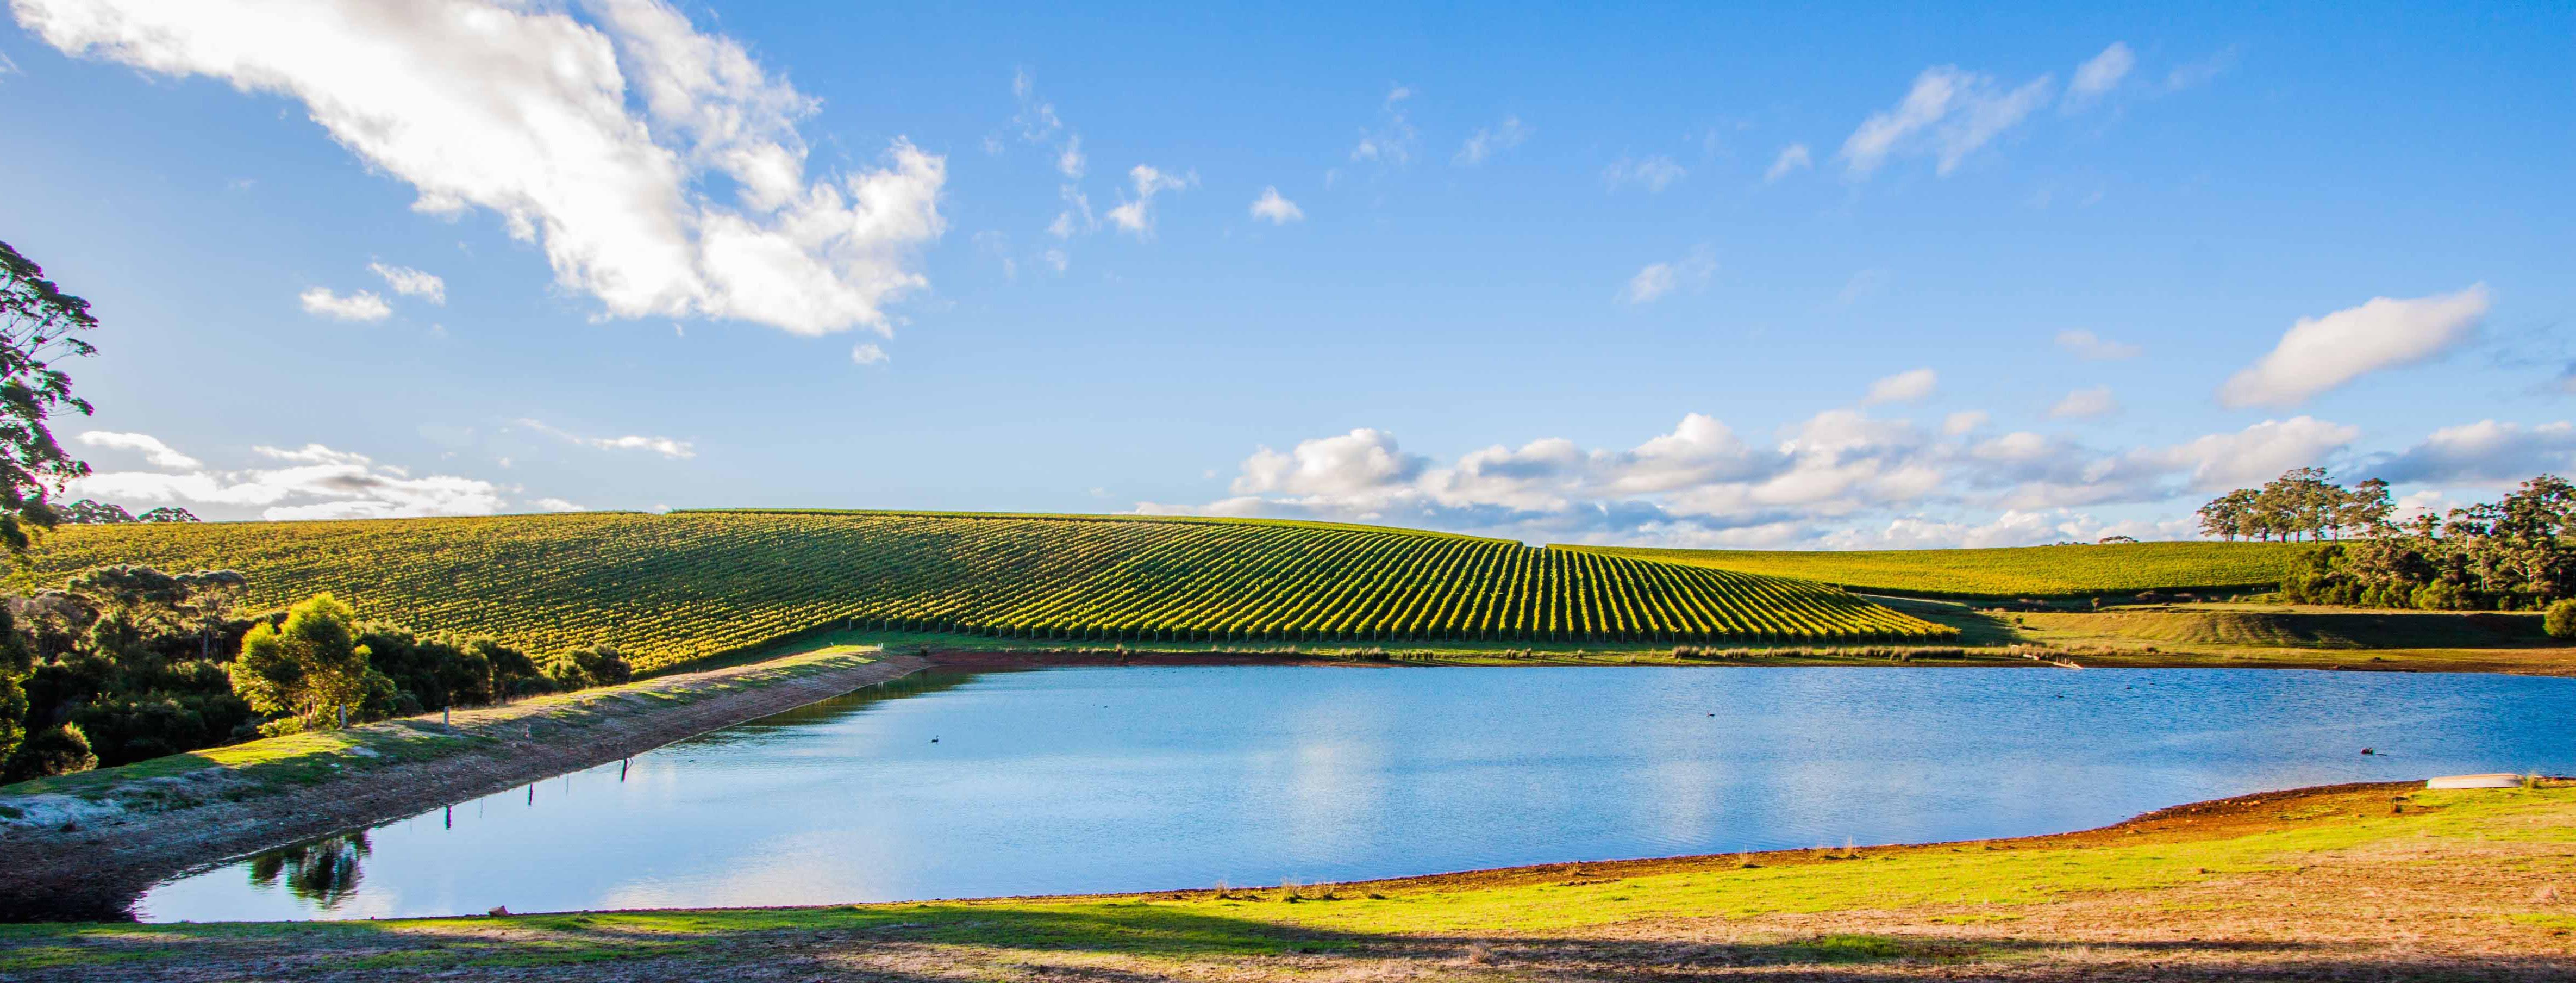 s3-vineyard